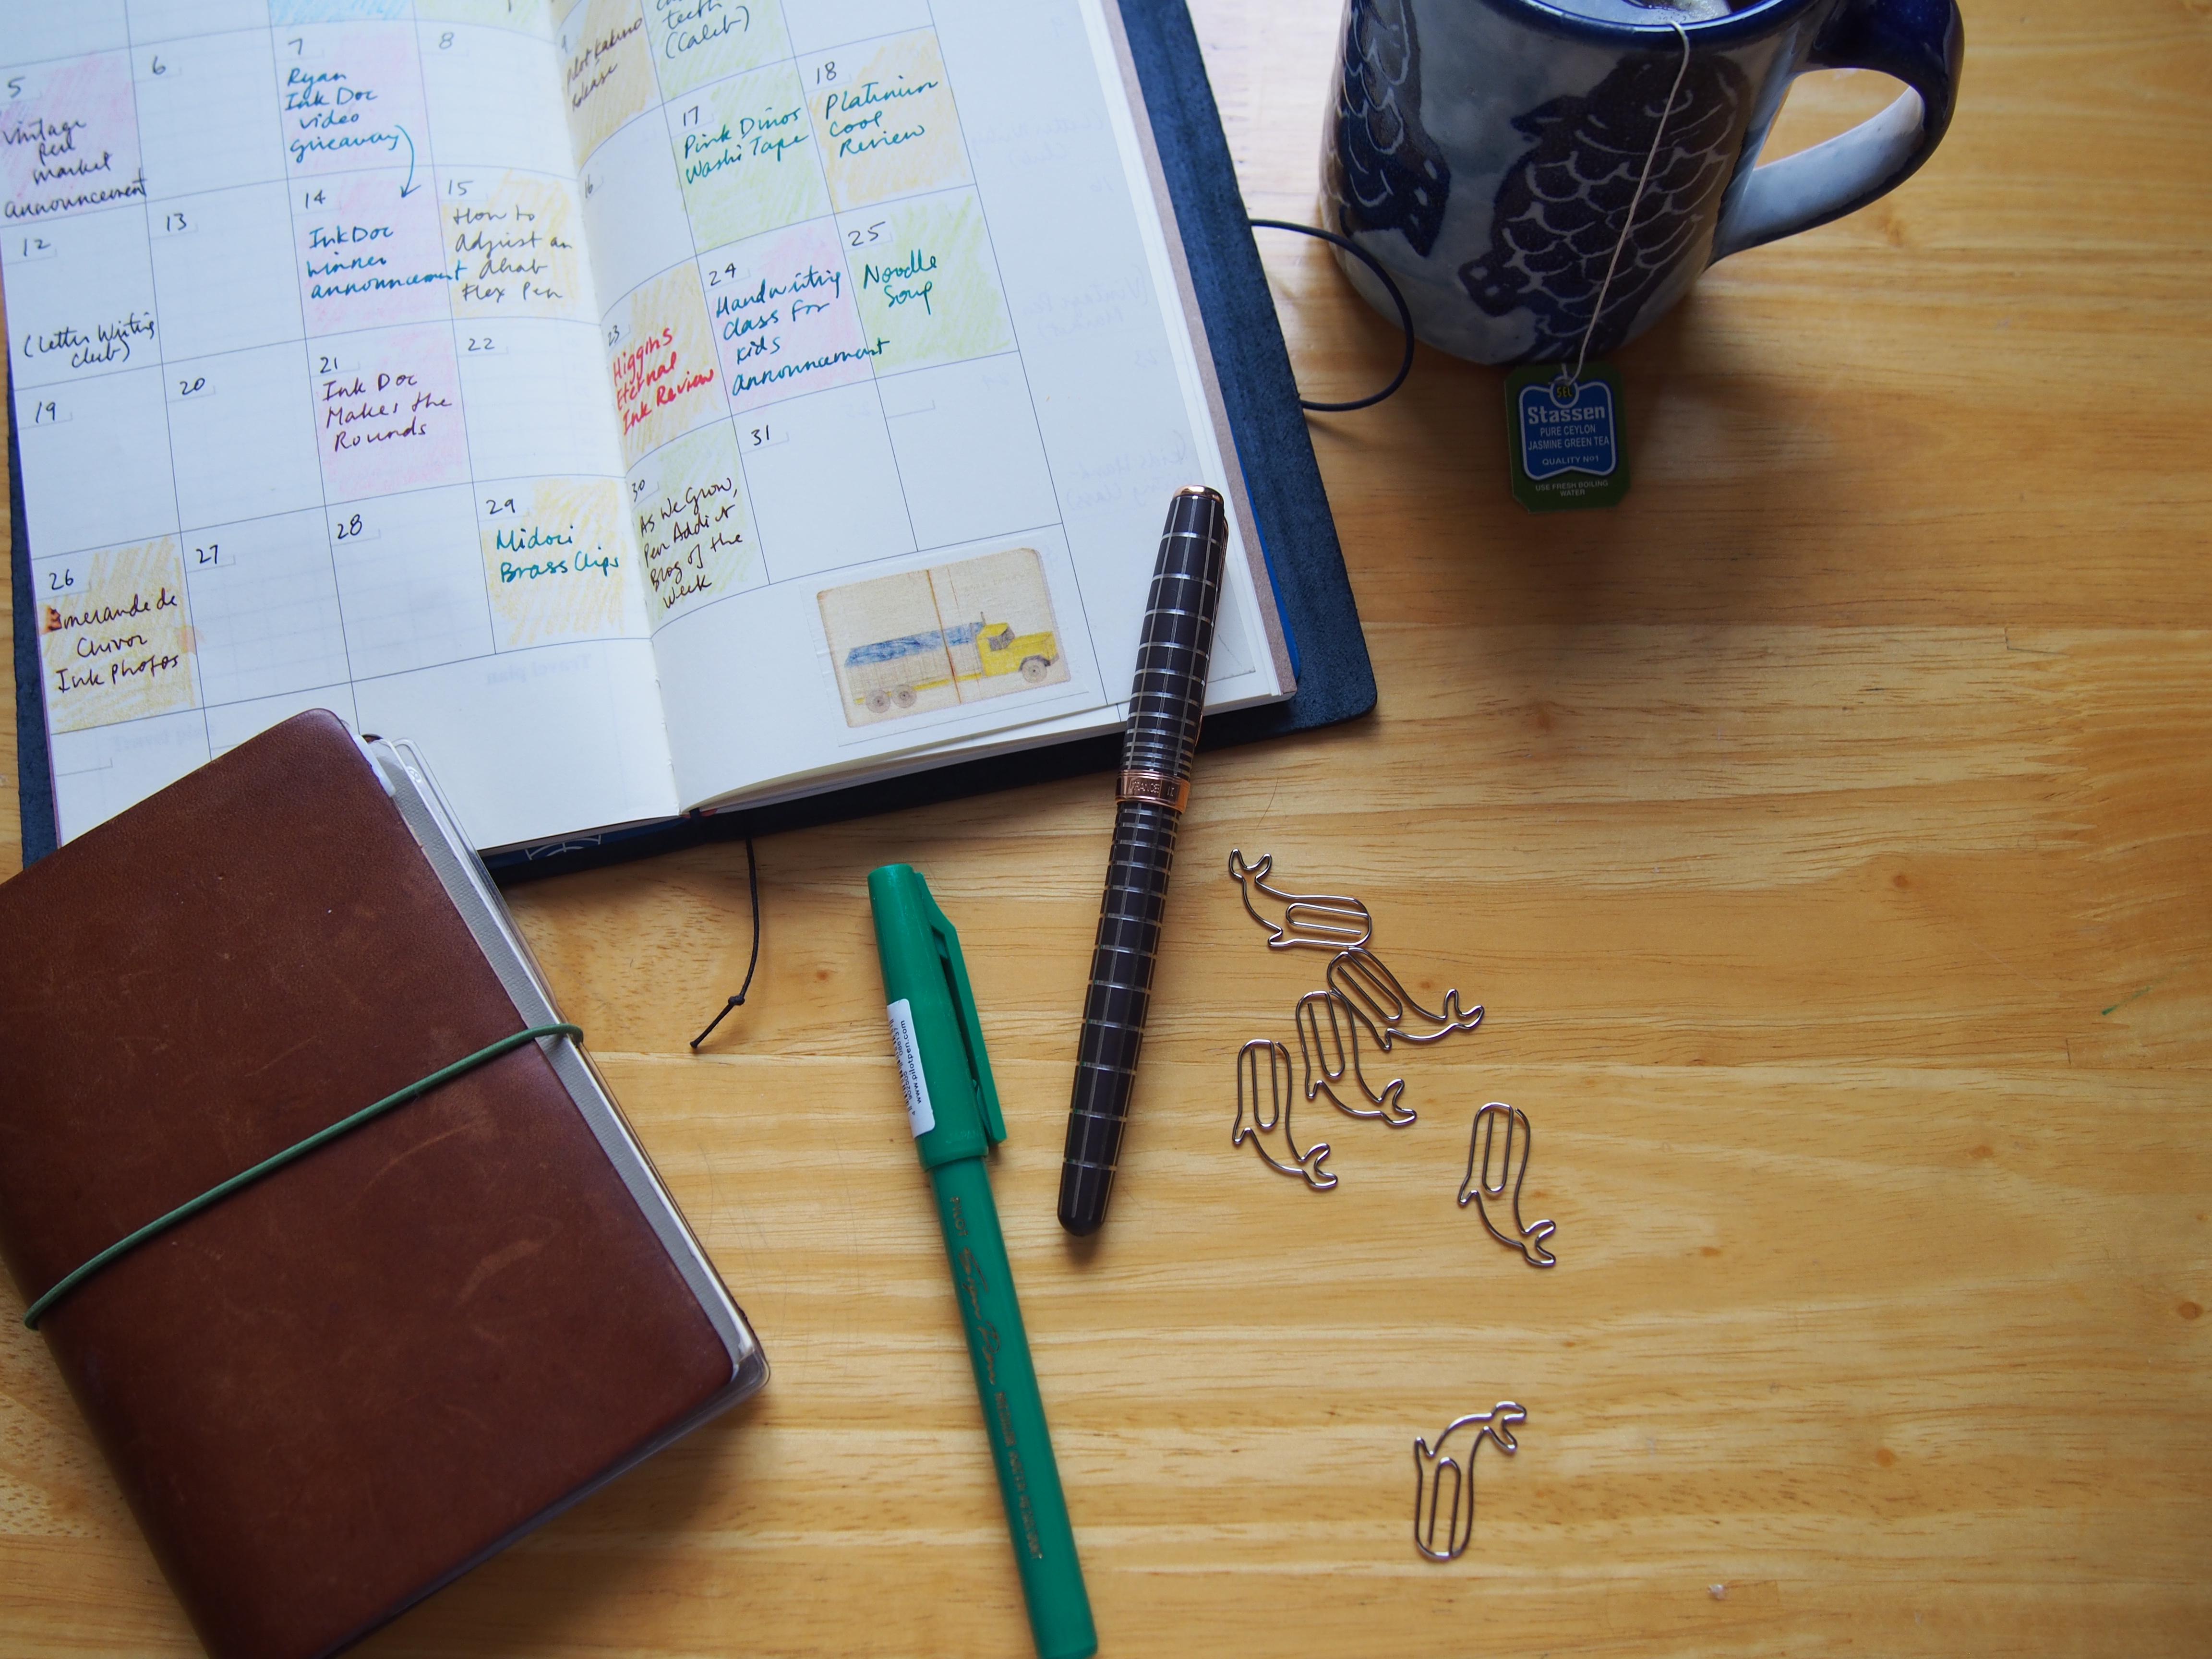 Midori Traveler's Notebook Set Up Wonder Pens Blog wonderpens.ca Toronto Canada